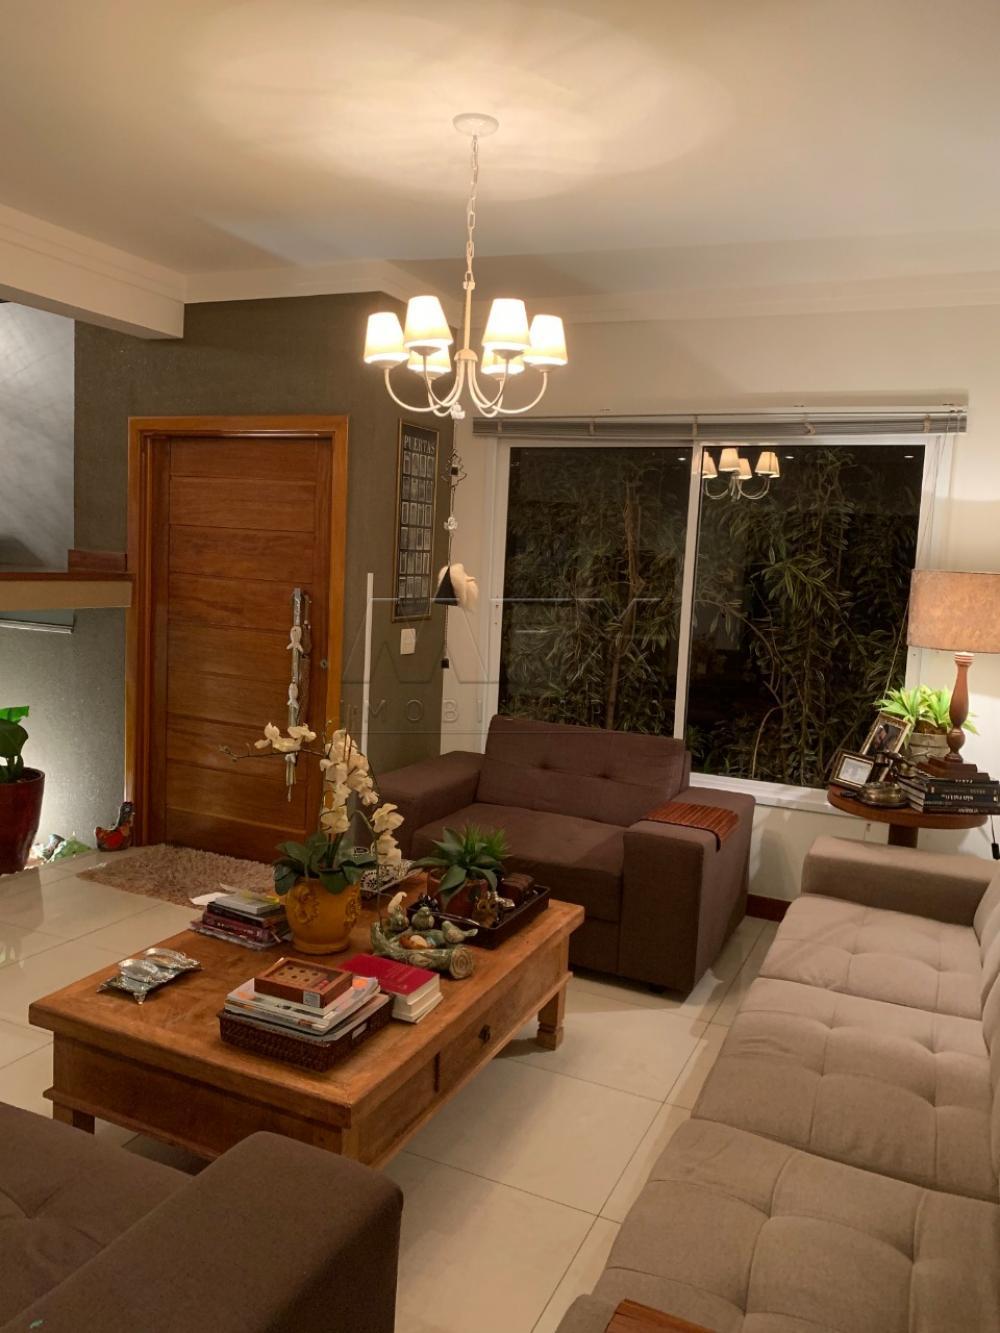 Comprar Casa / Condomínio em Bauru apenas R$ 1.500.000,00 - Foto 10